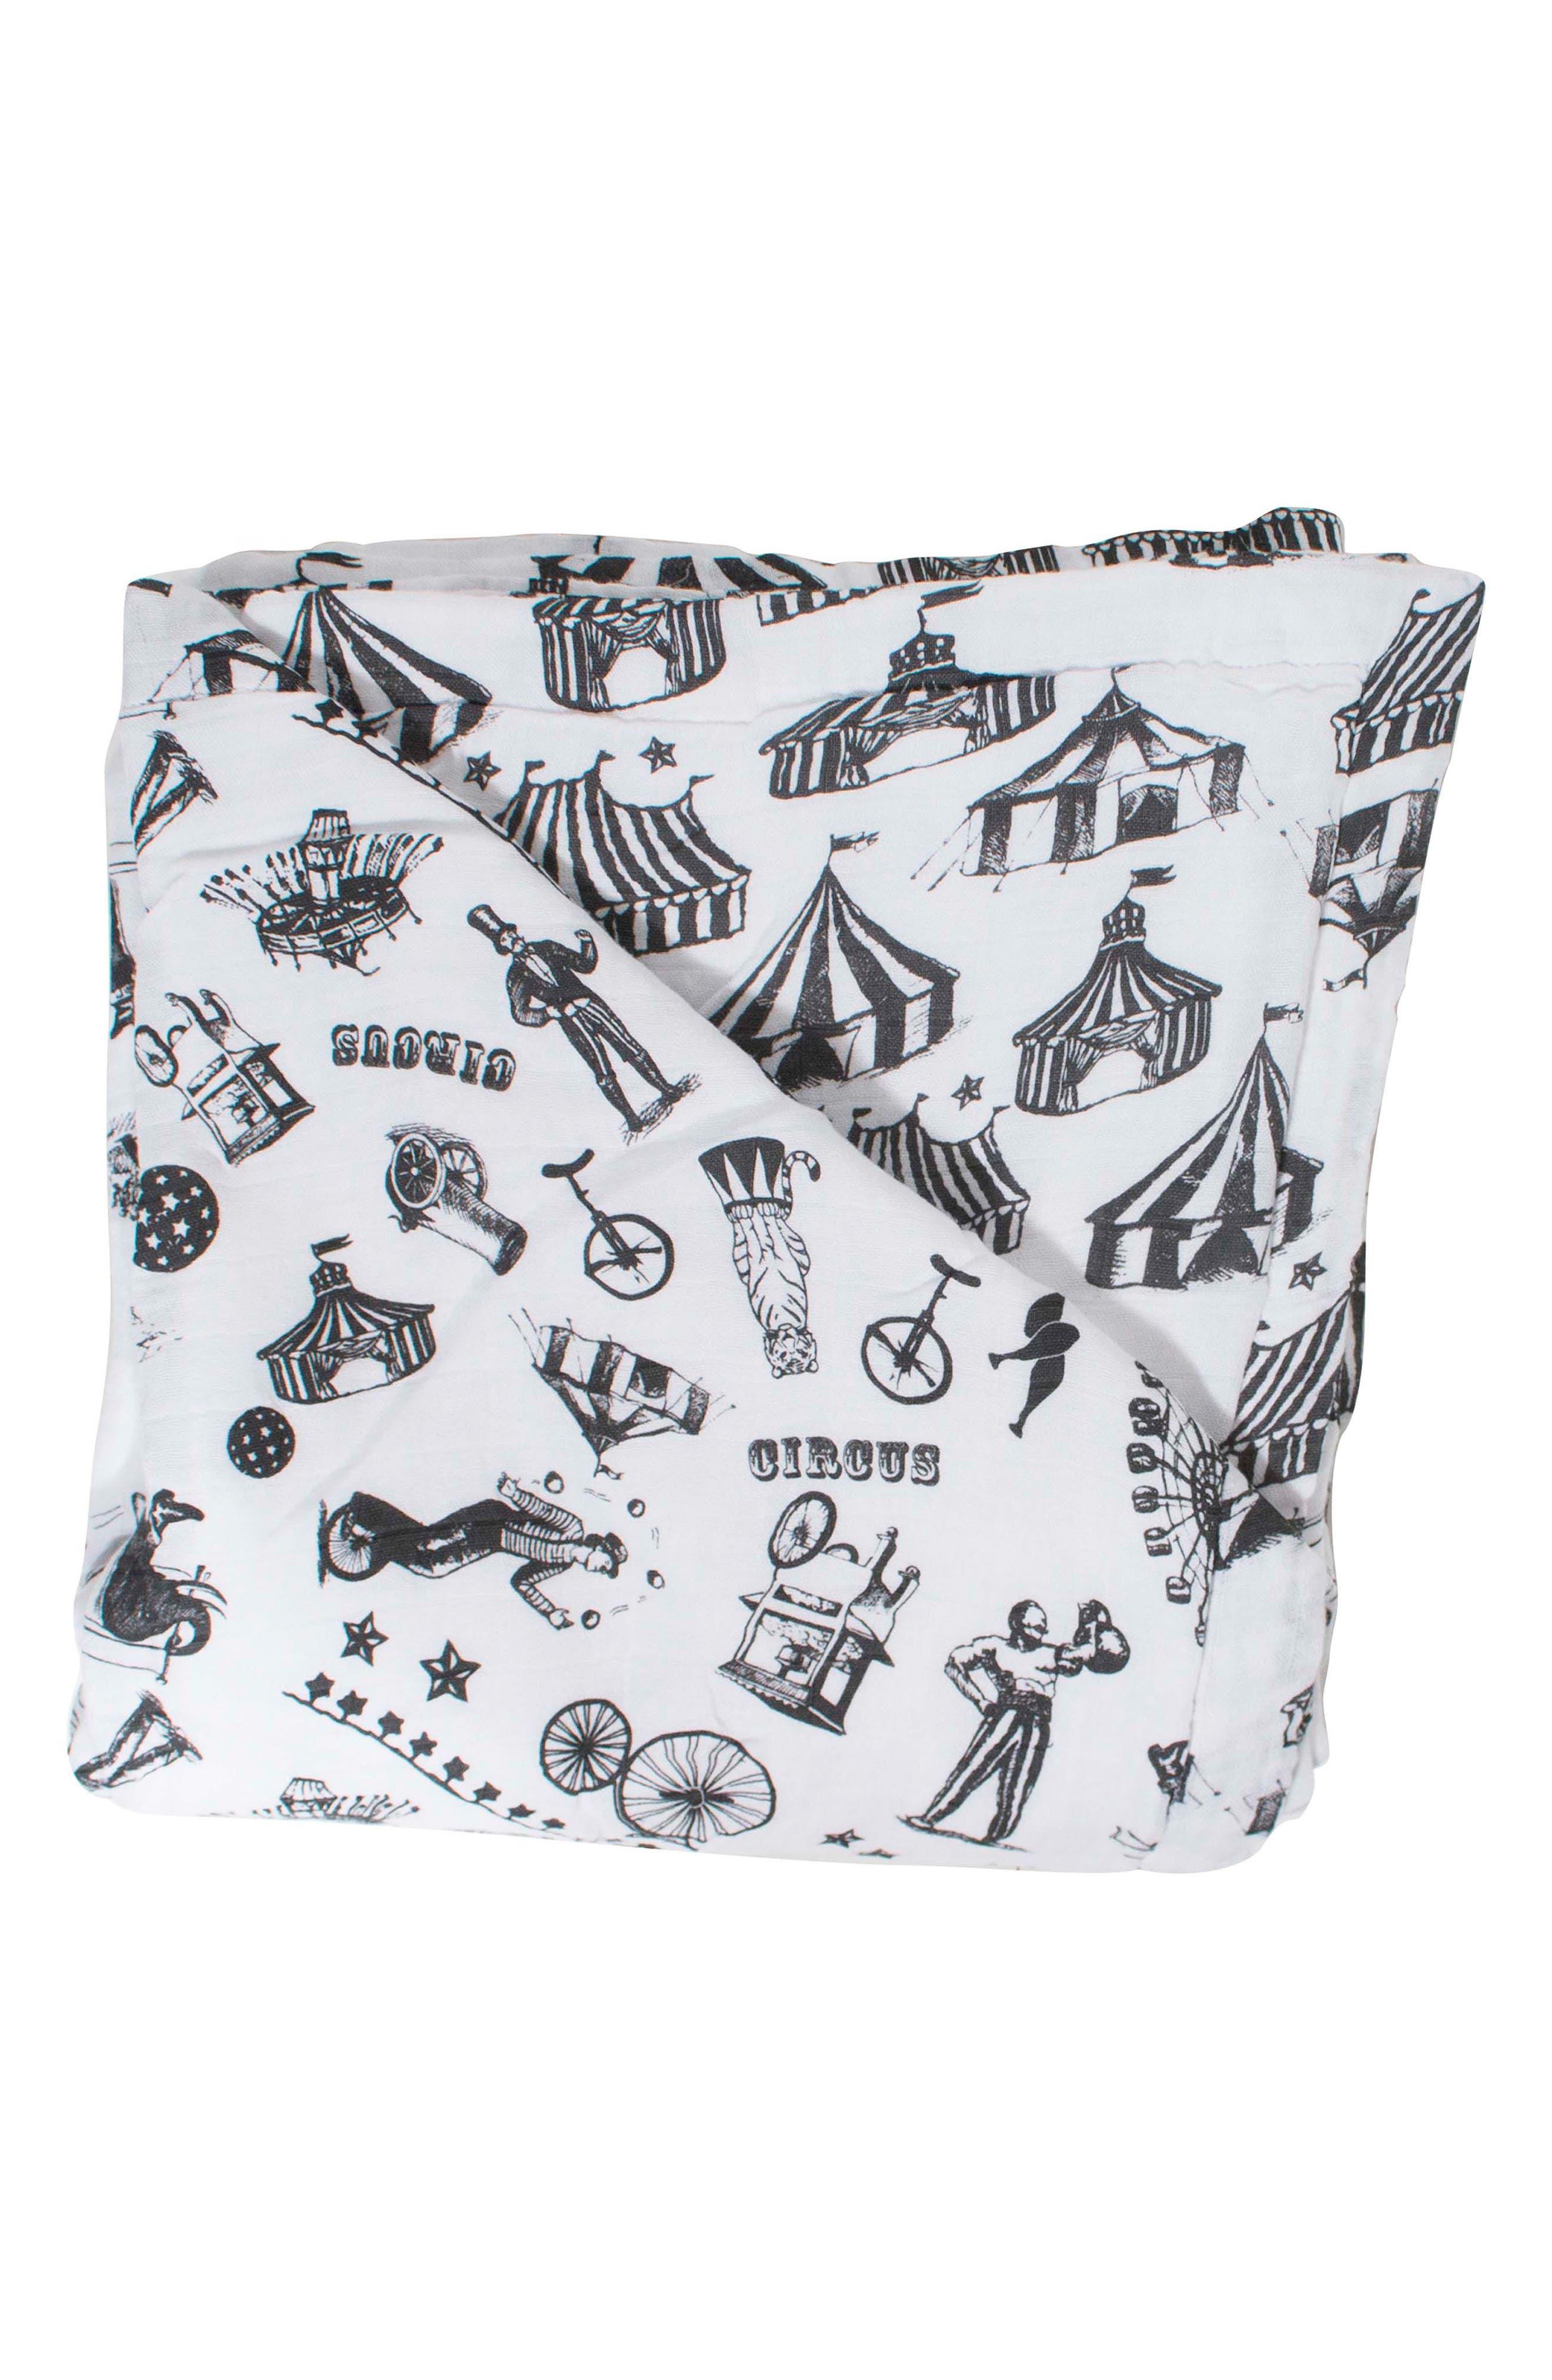 Oh So Soft Snuggle Blanket,                             Main thumbnail 1, color,                             CIRCUS/ HIGH TOPS